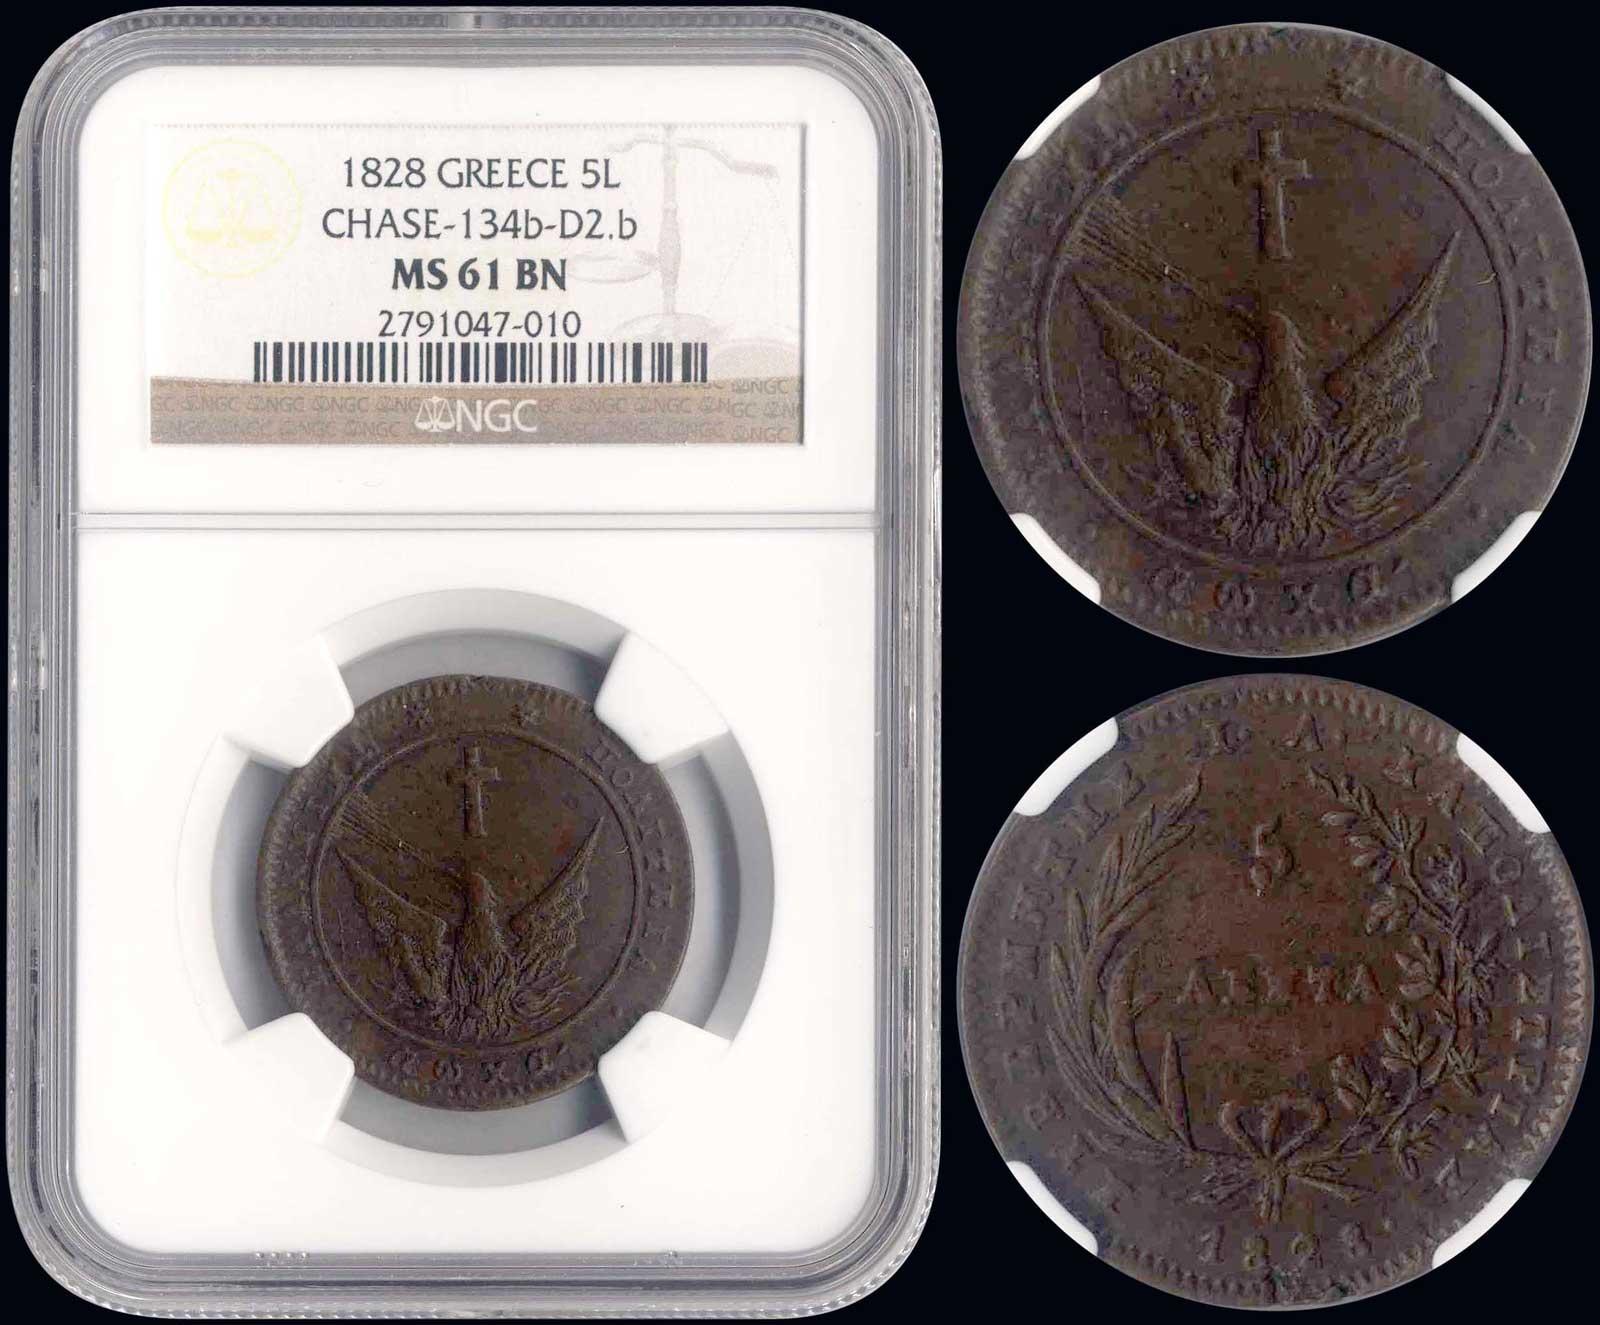 Lot 9004 - GREECE-  COINS & TOKENS governor capodistrias -  A. Karamitsos Public & LIVE Bid Auction 610 Coins, Medals & Banknotes